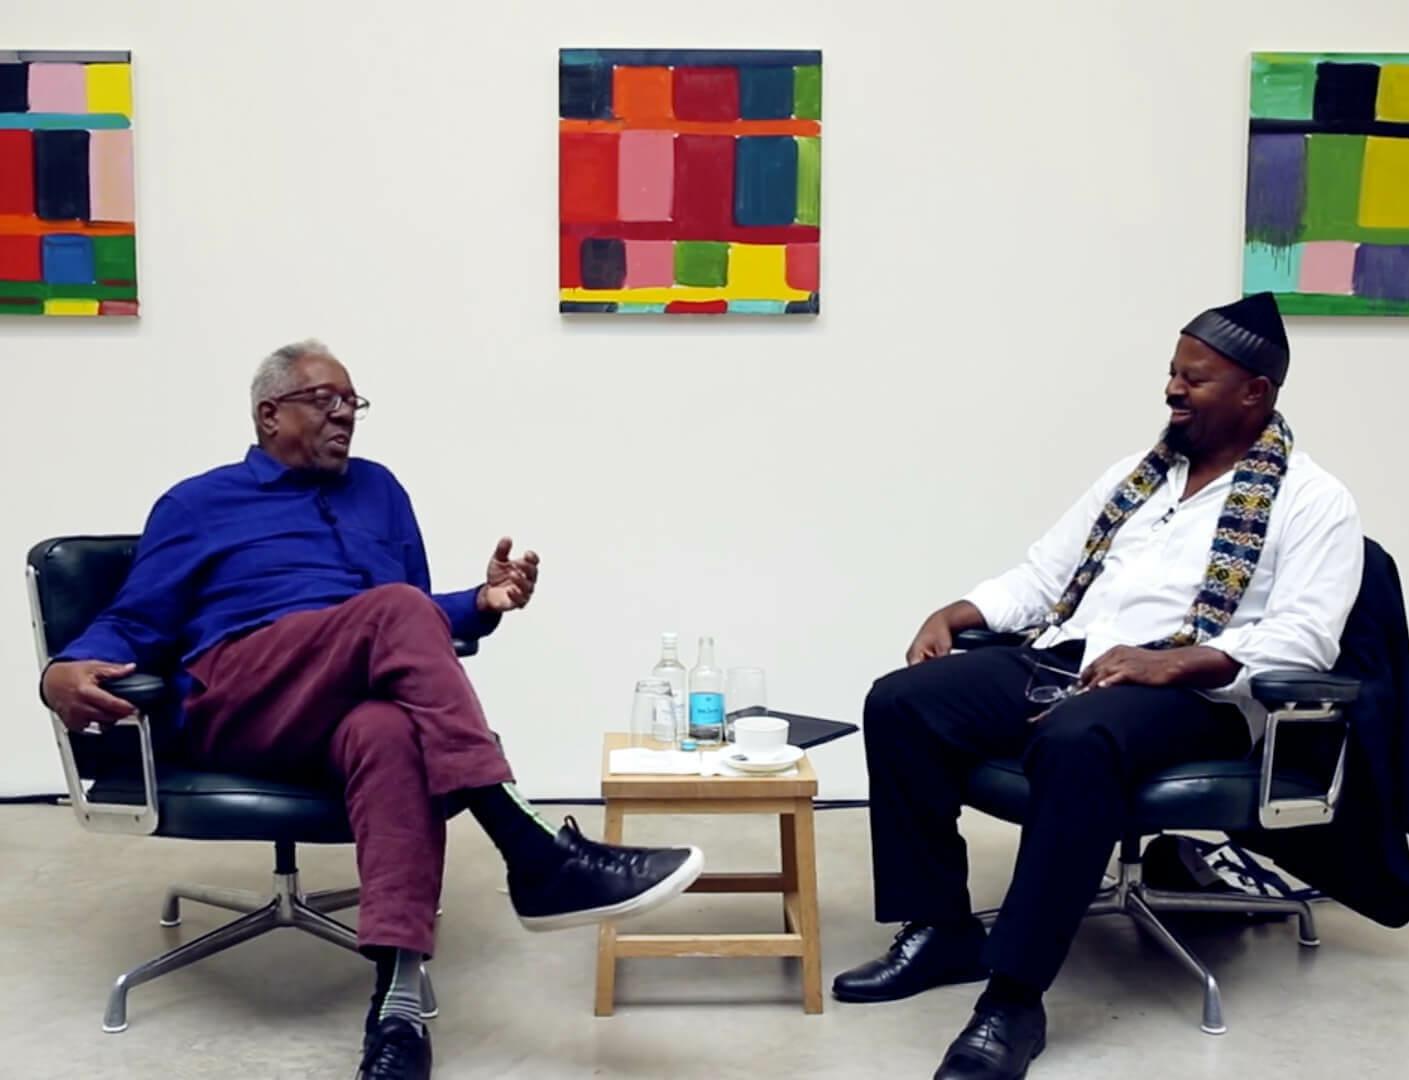 Watch now: Stanley Whitney and Ben Okri in conversation